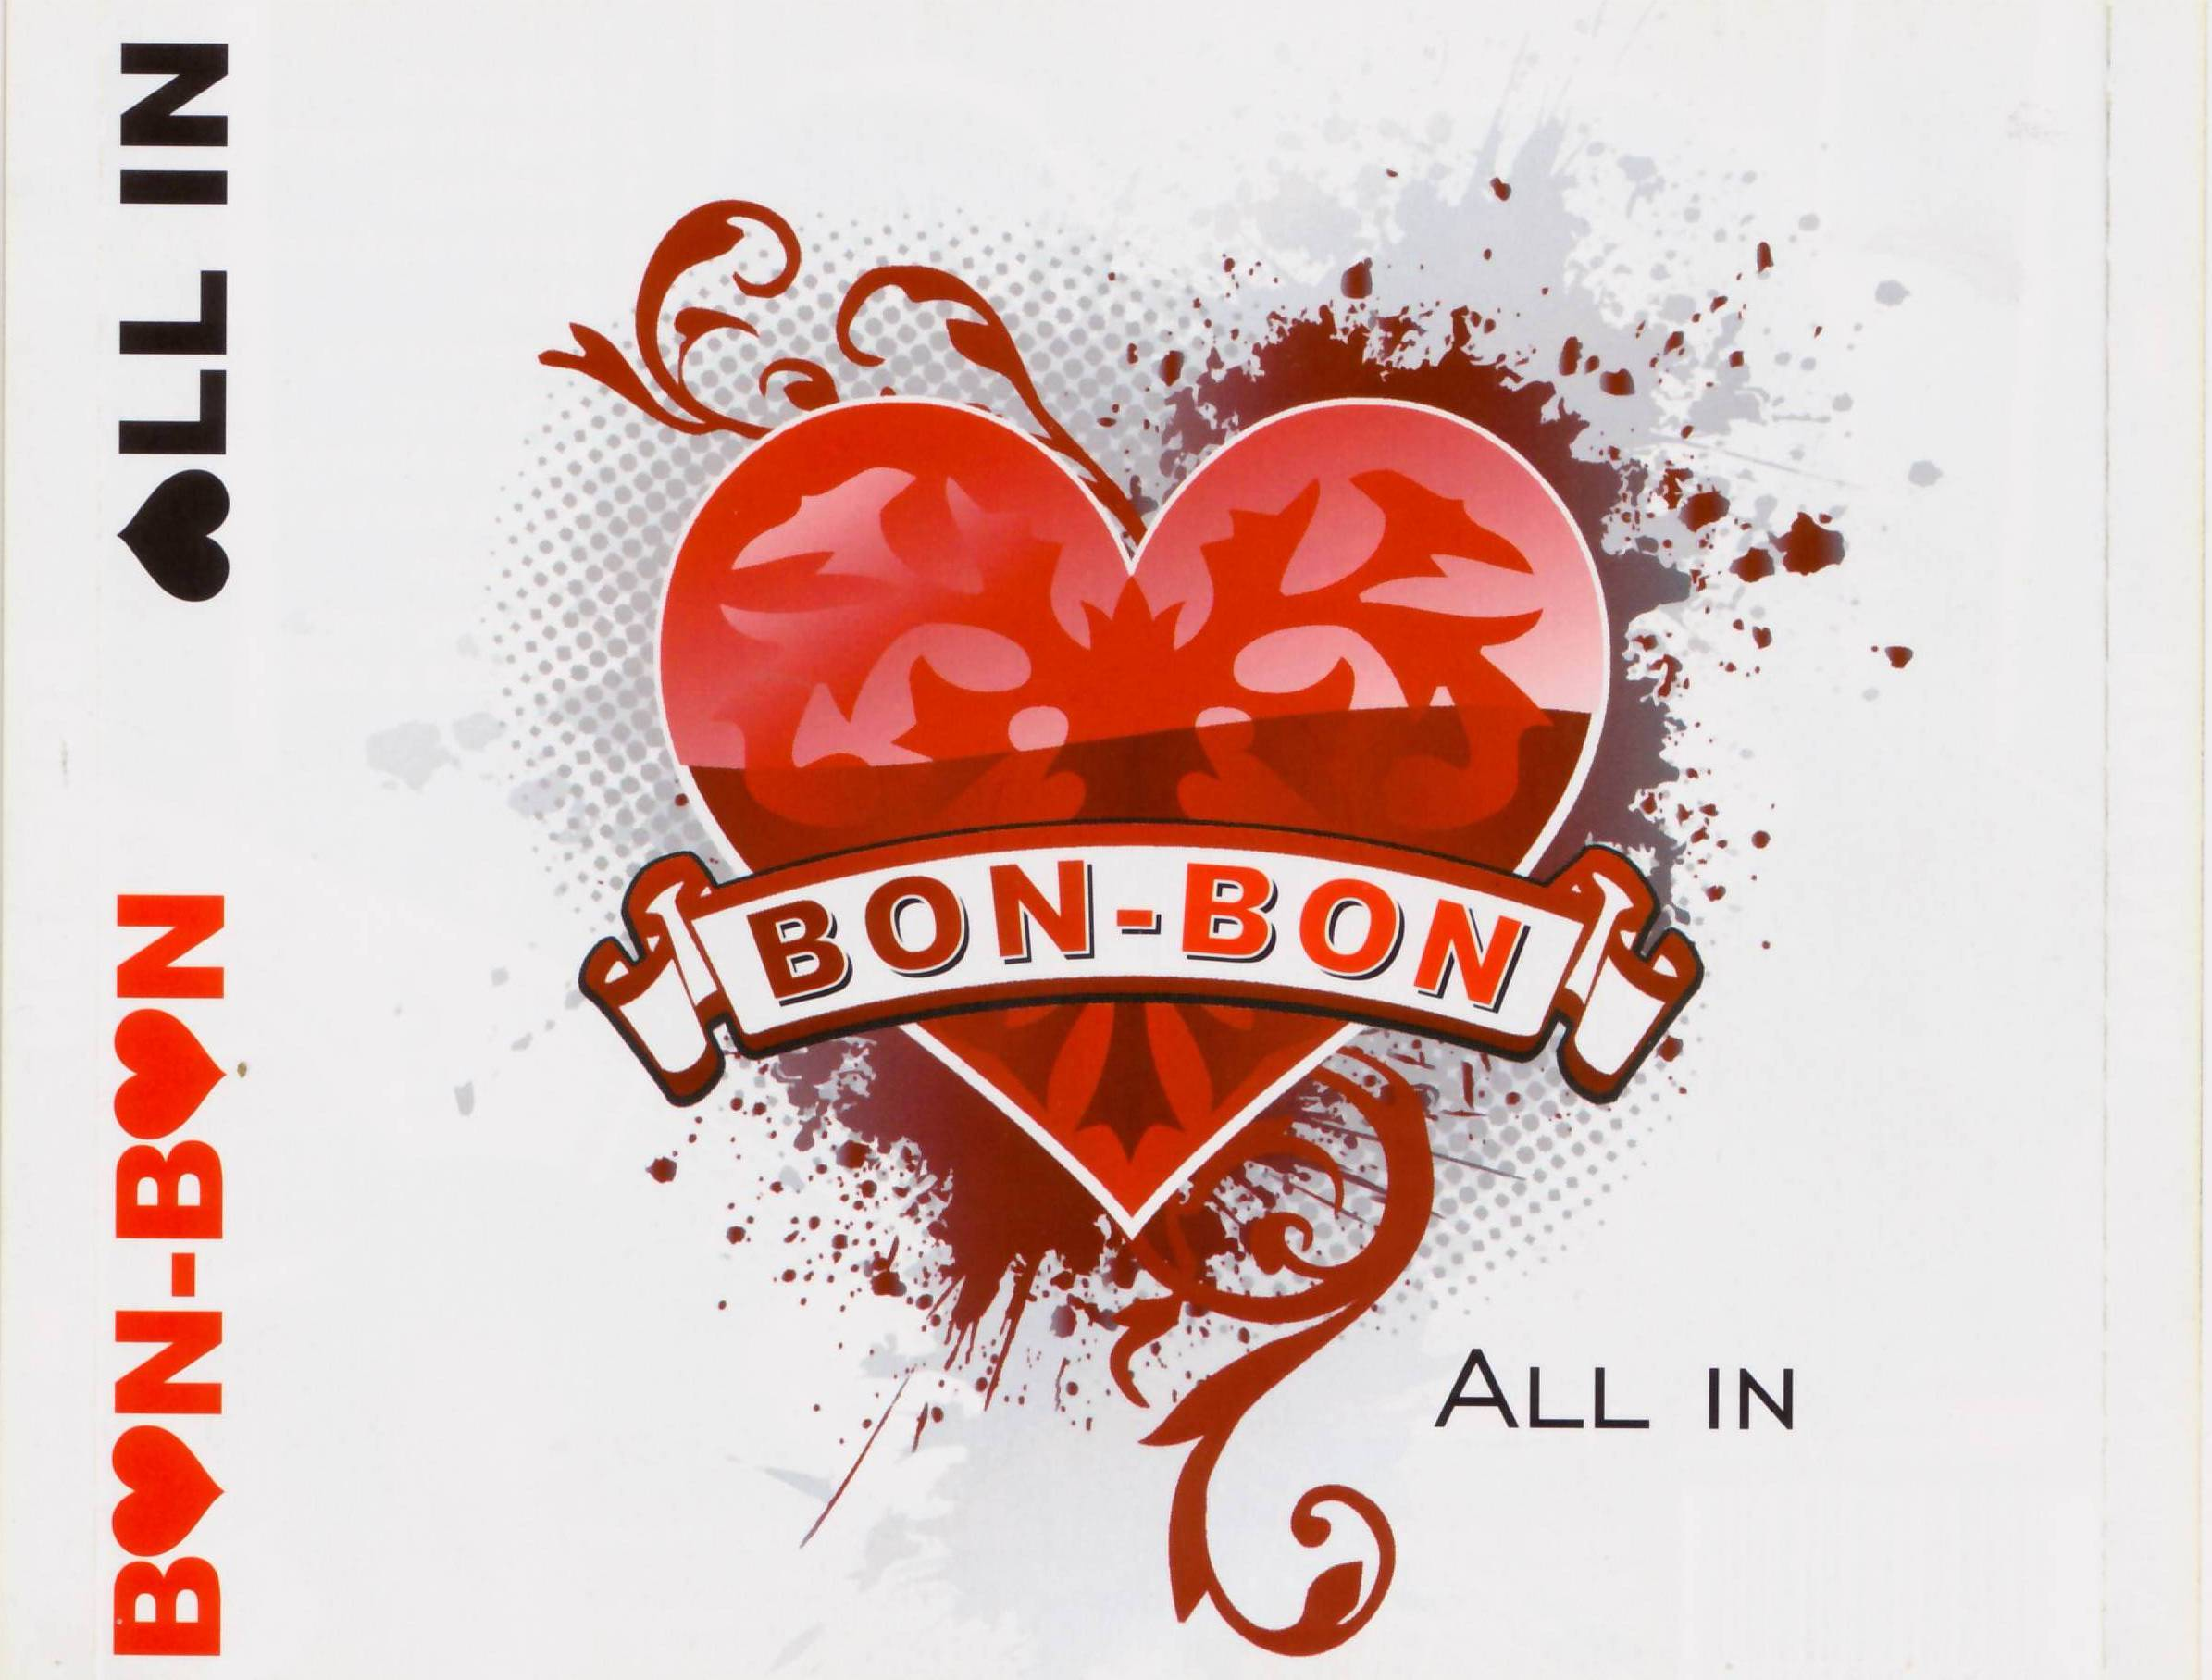 Bon Bon All In